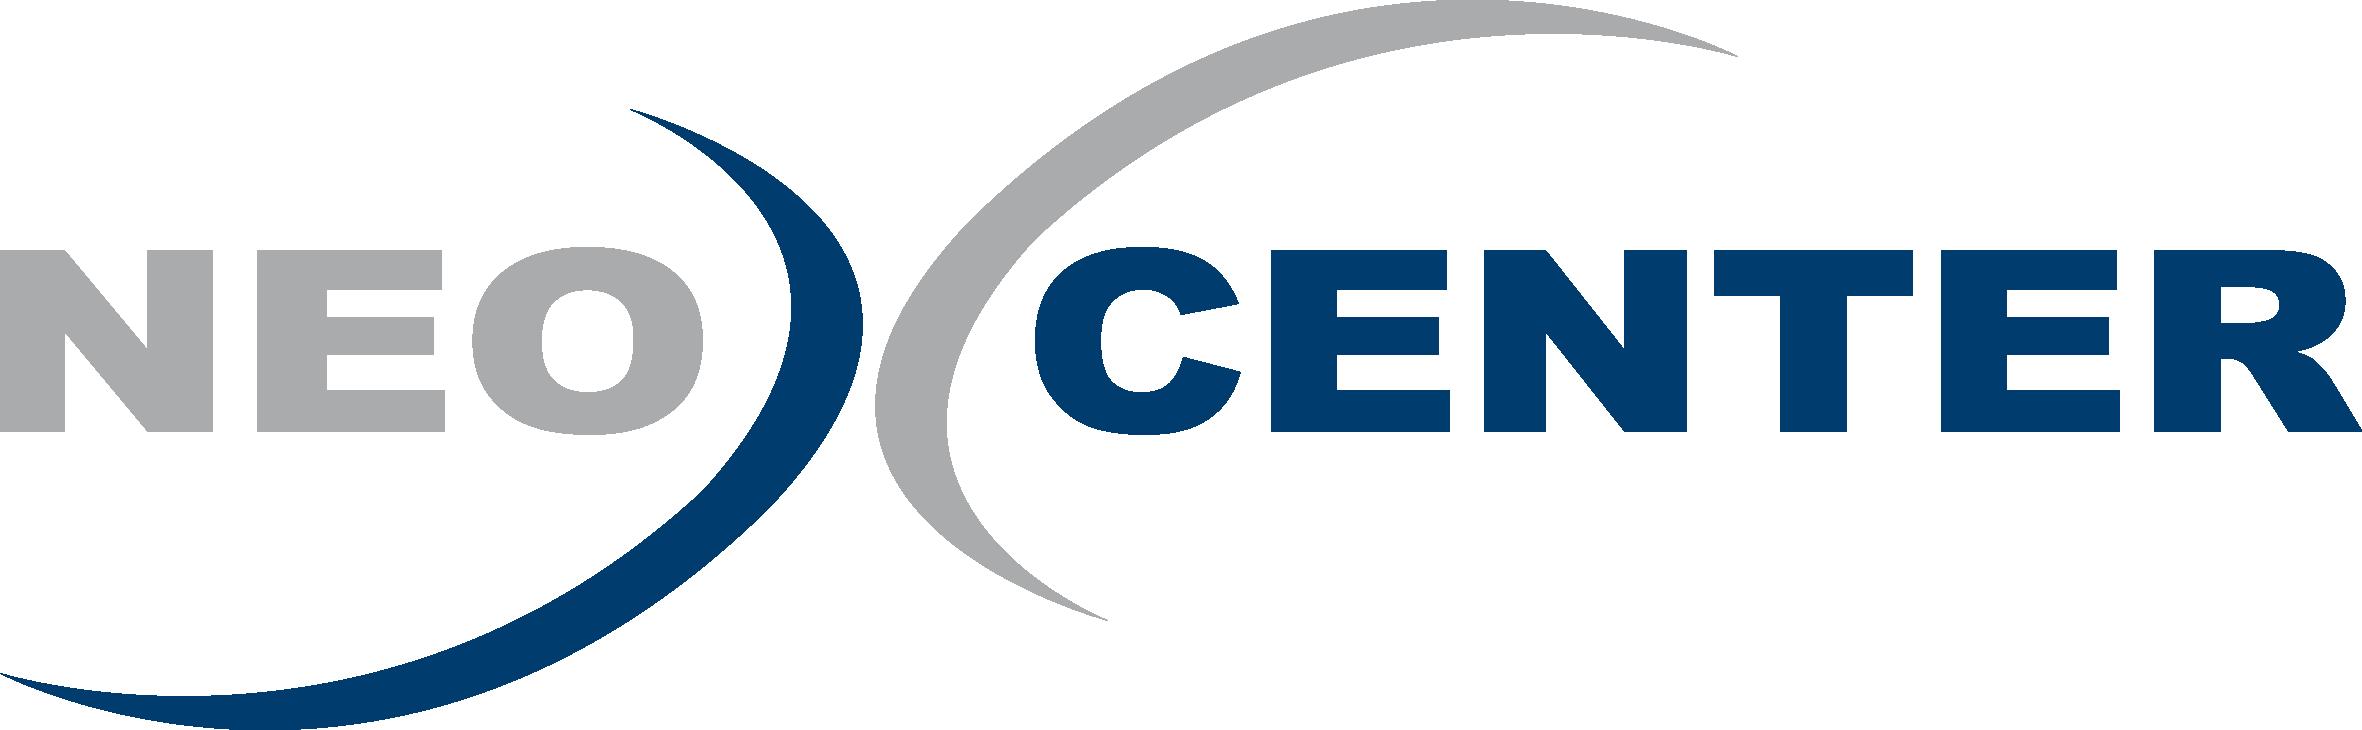 LogoNeocenter-2